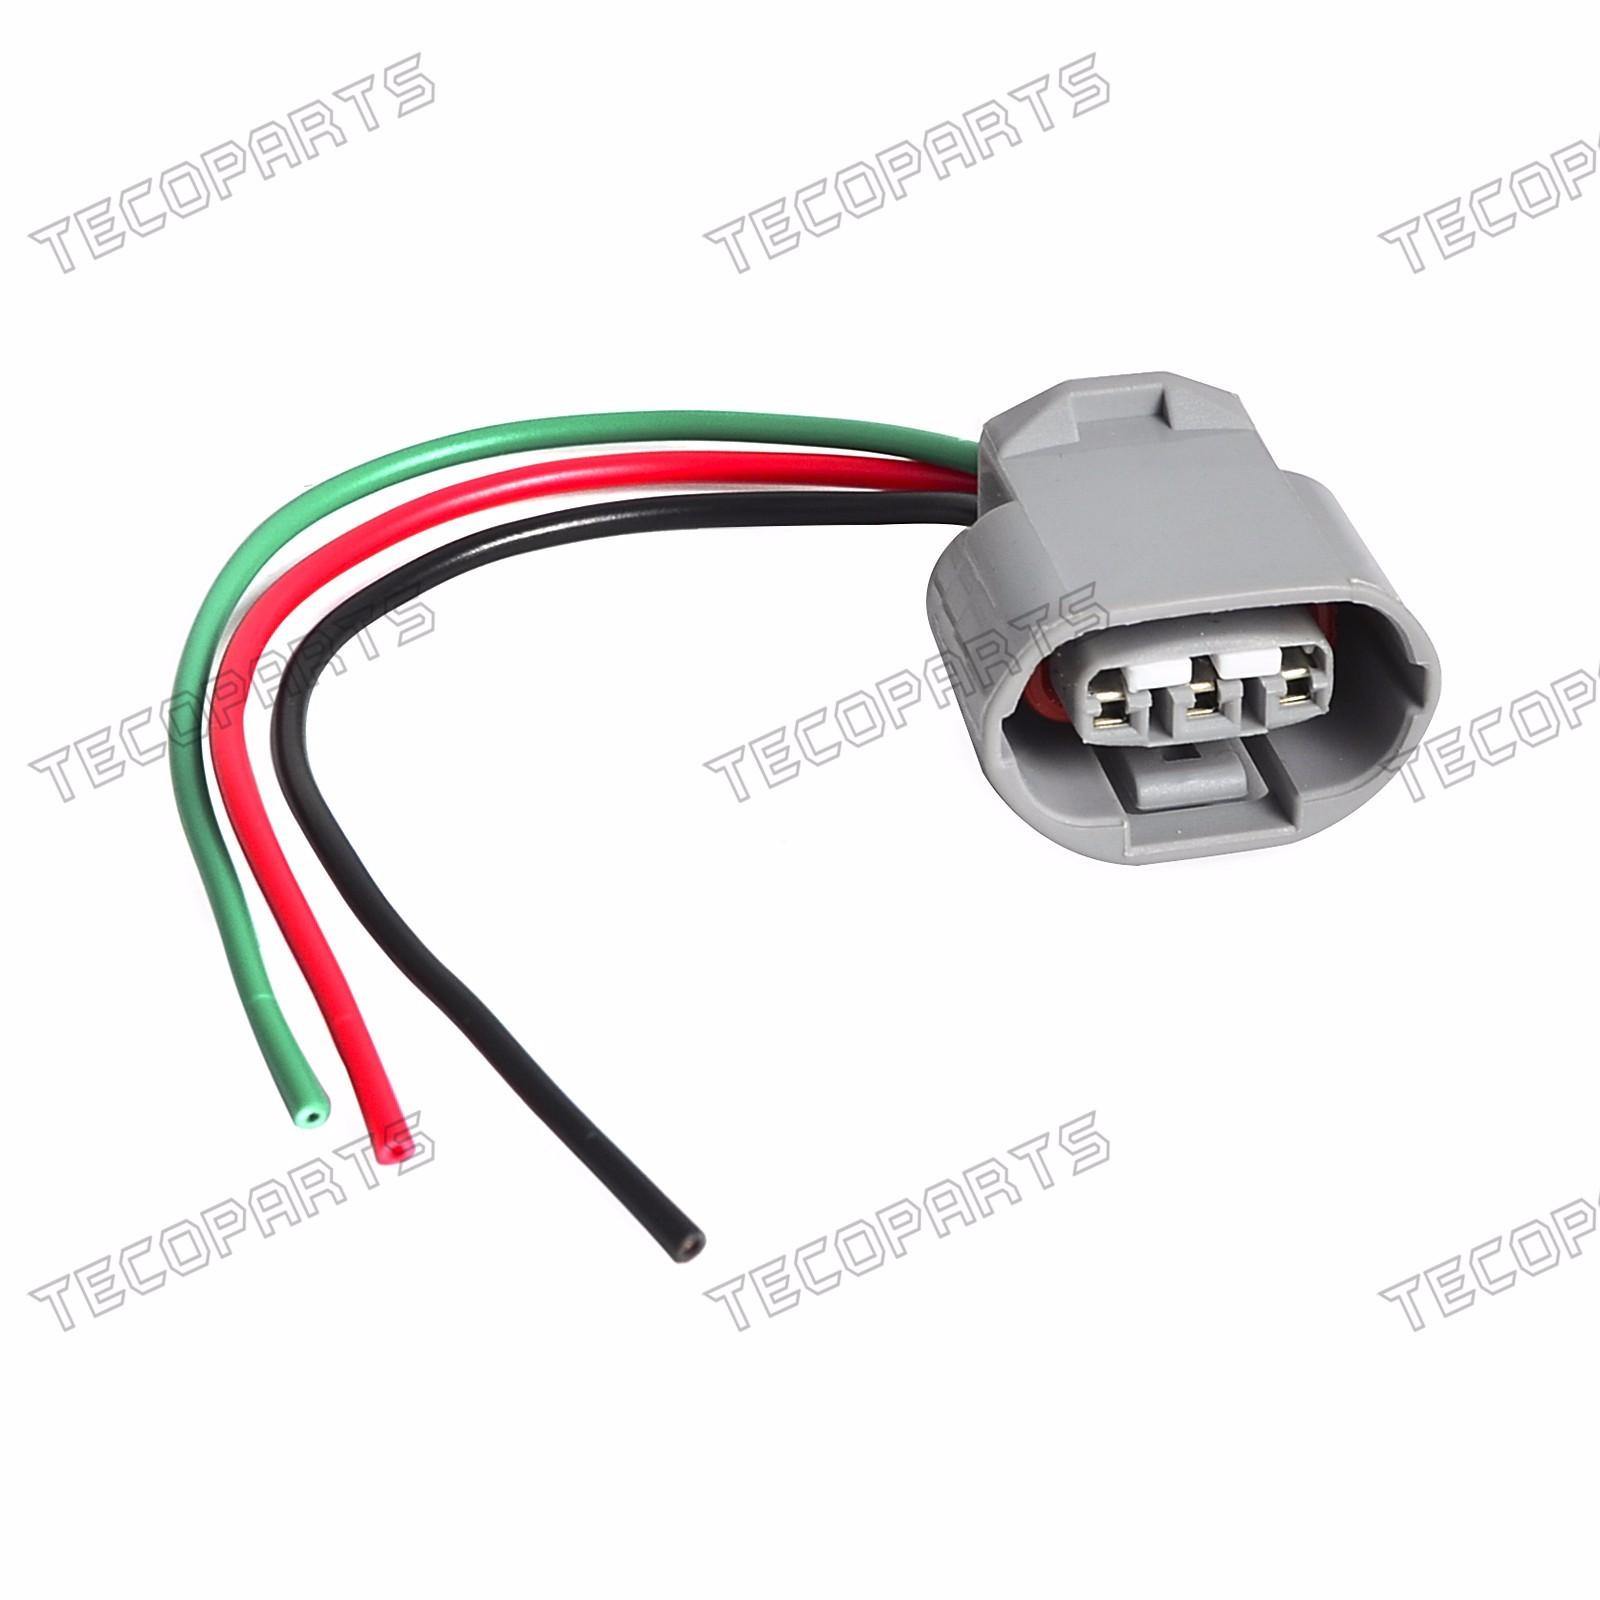 3 pin alternator wiring diagram 72 nova nissan murano harness